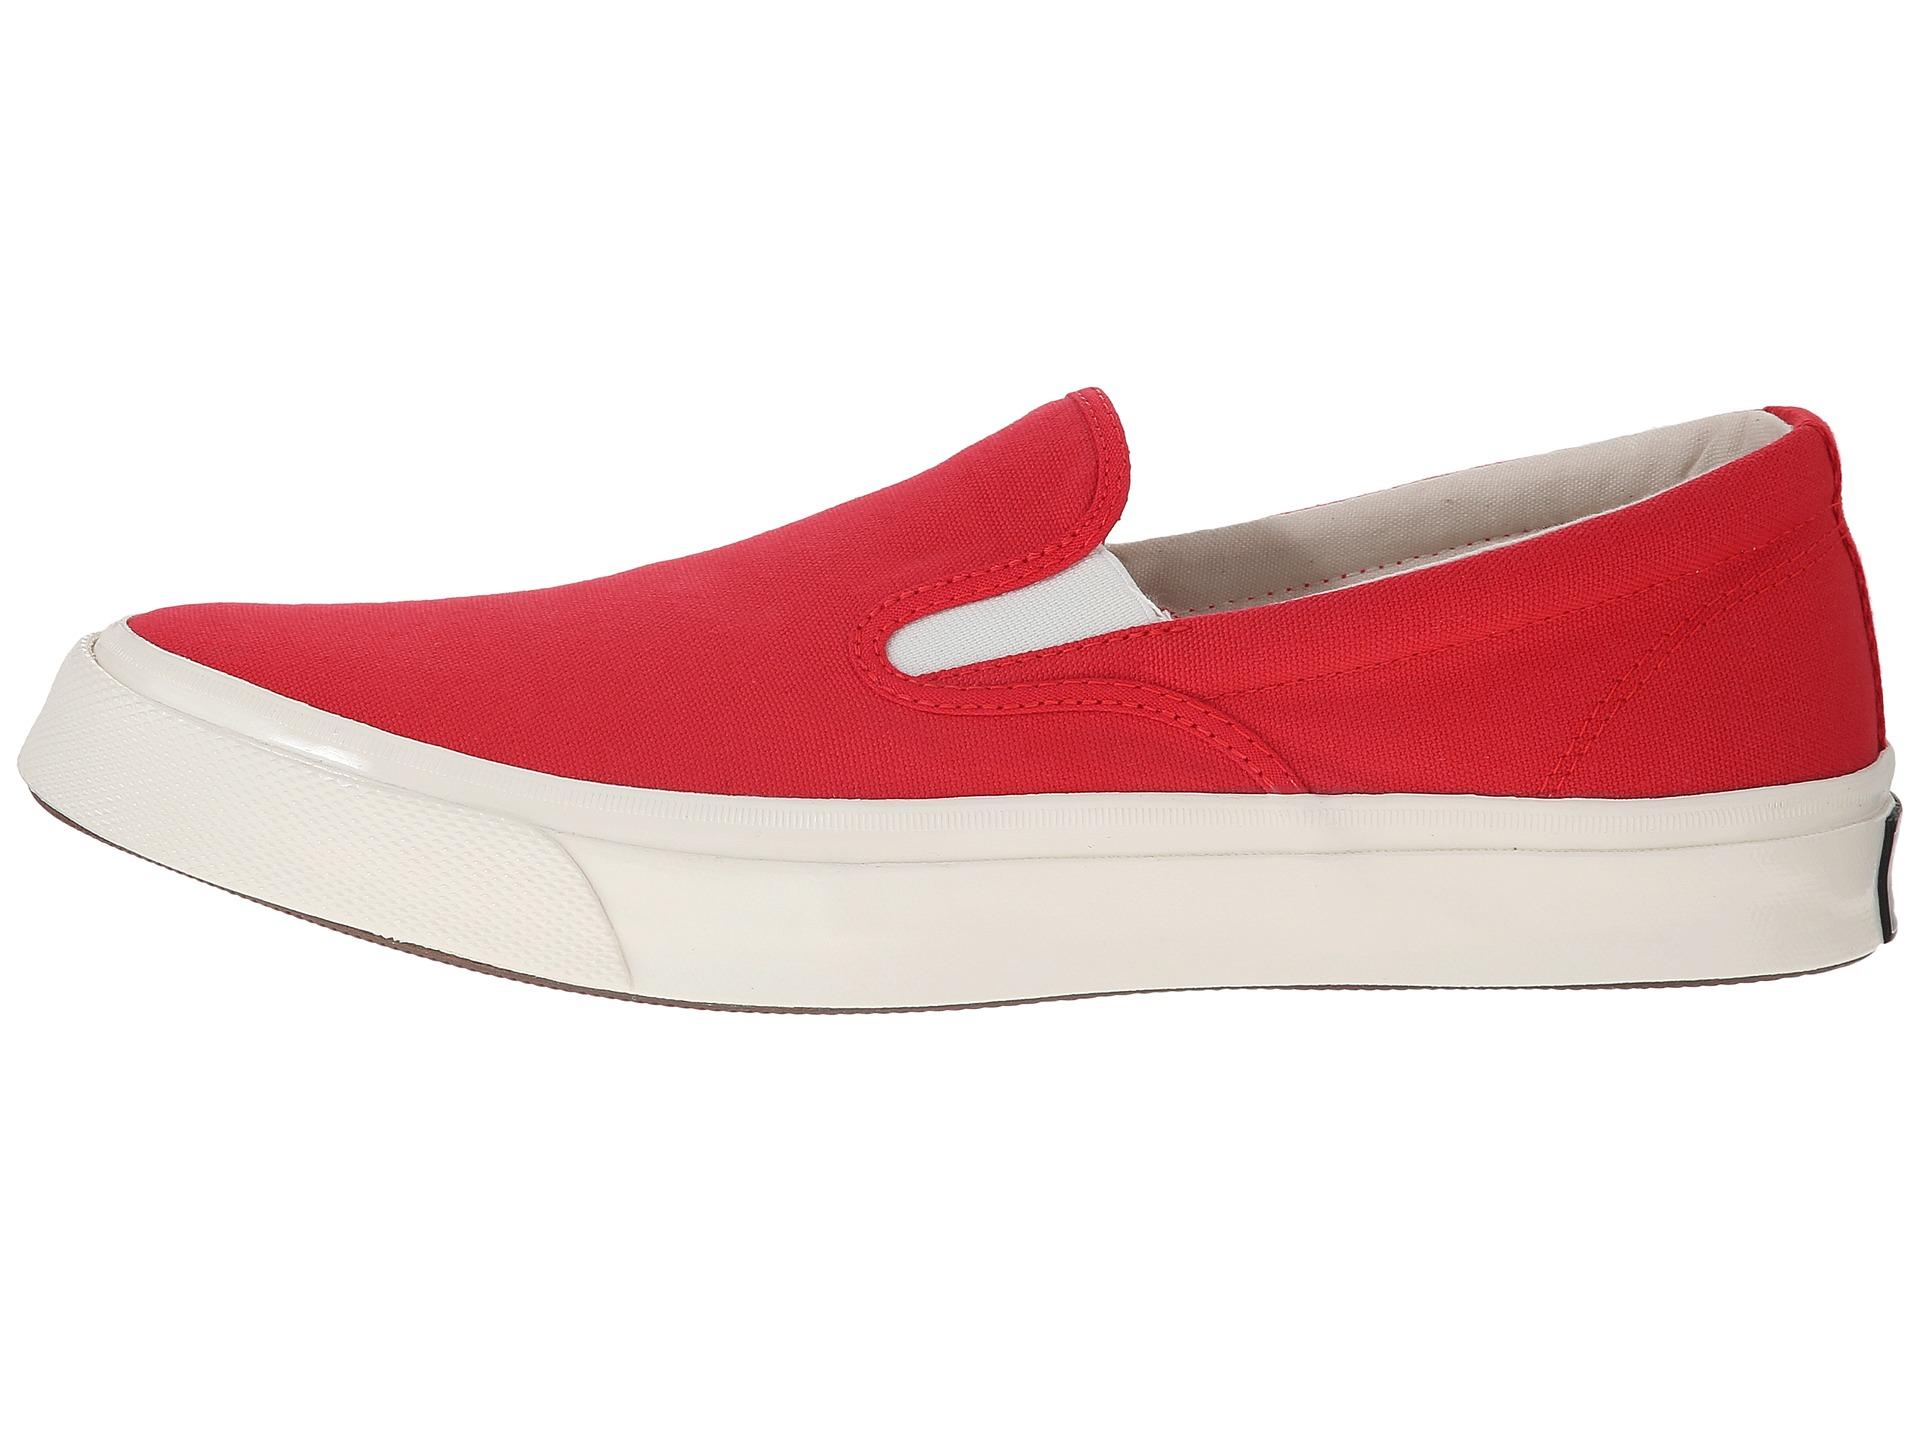 23ea076d9a83 Lyst - Converse Deck Star  70 Slip in Red